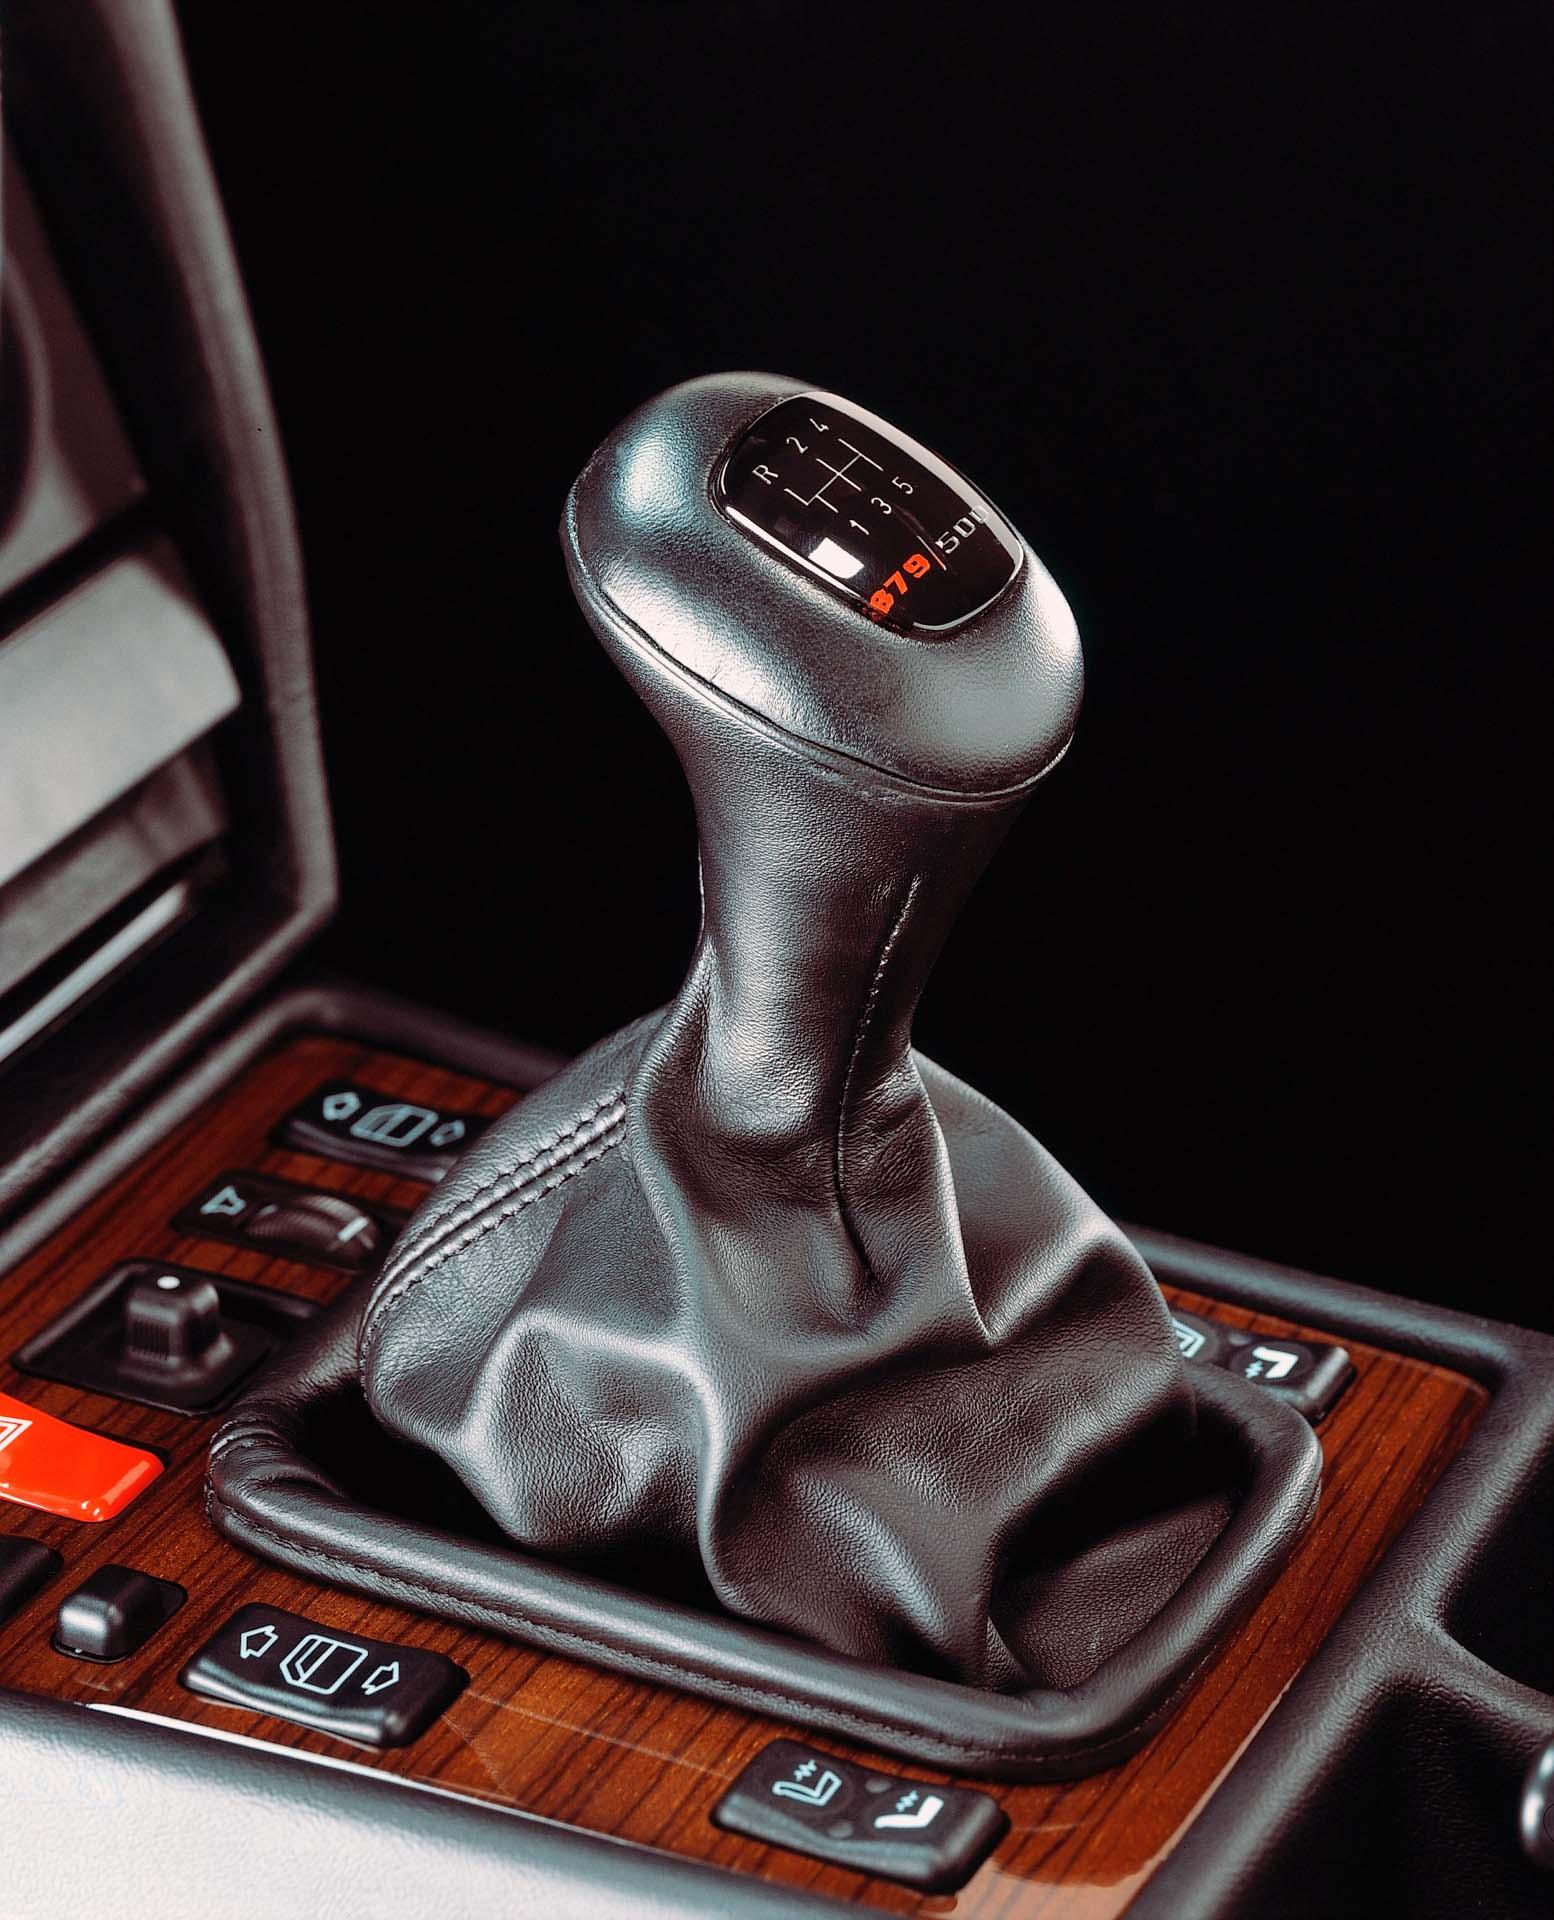 Mercedes-Benz 190 E 2.5-16 Evolution II, Interieur. Foto aus dem Jahr 1990.